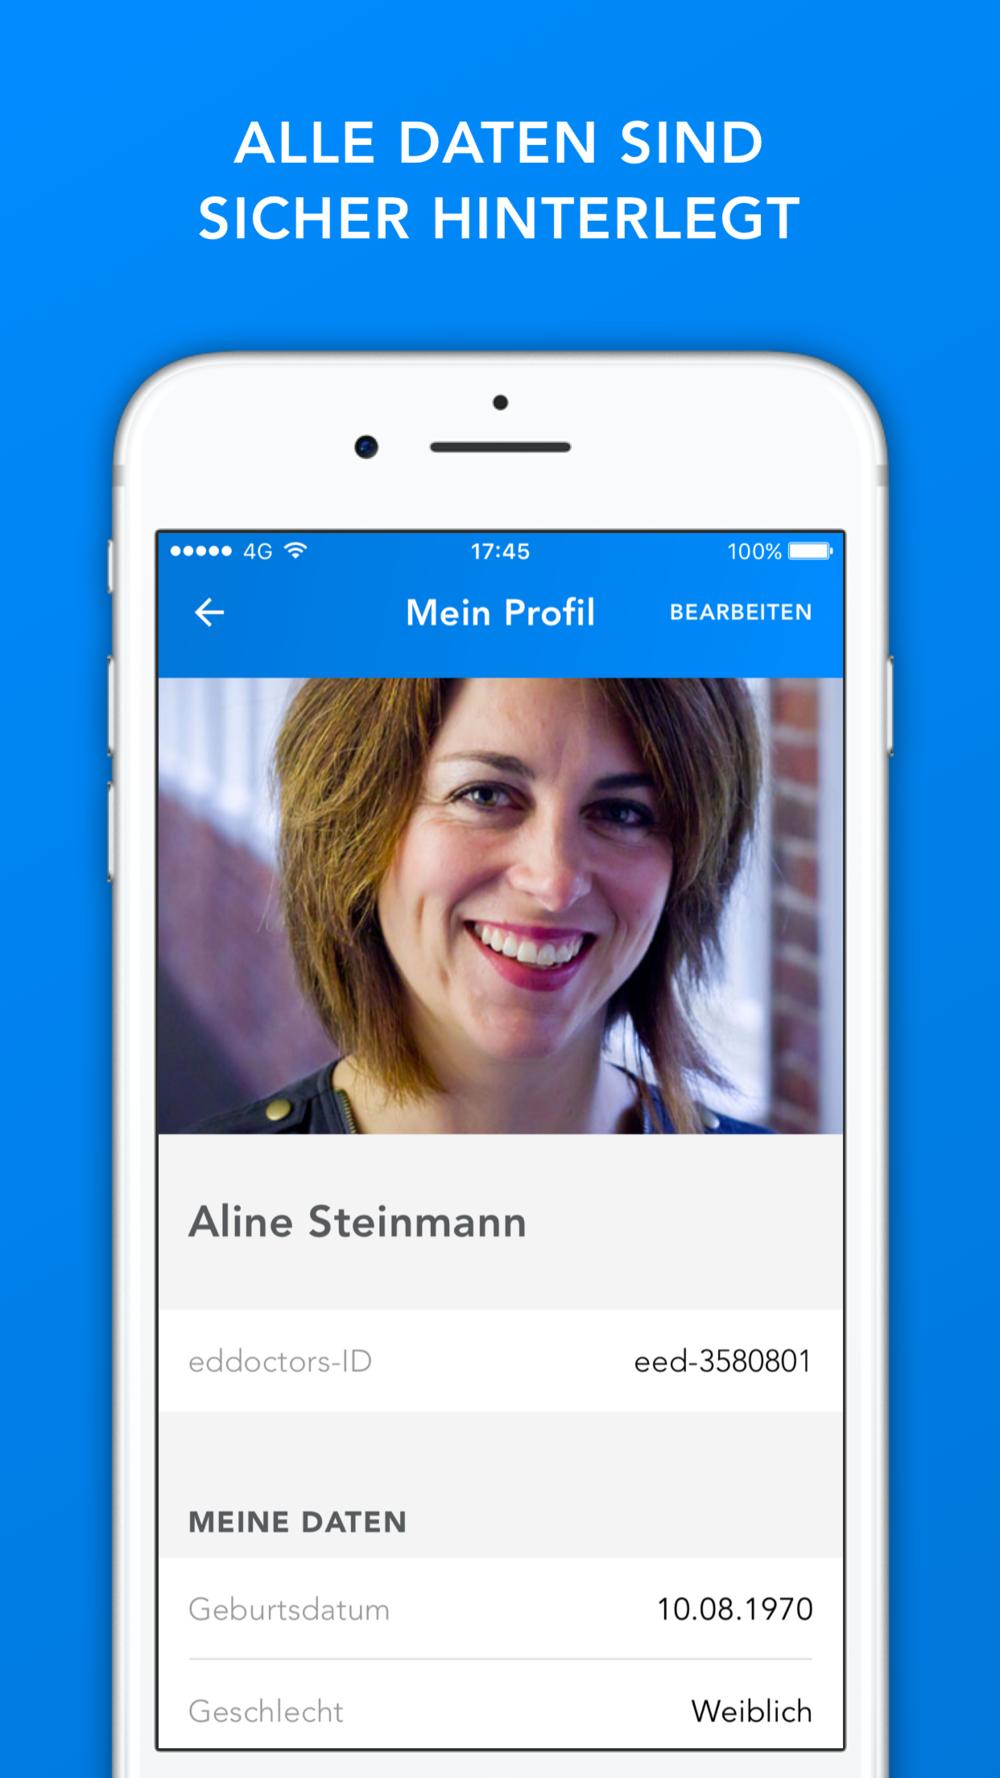 eedoctors App User Profil Design by Apps with love